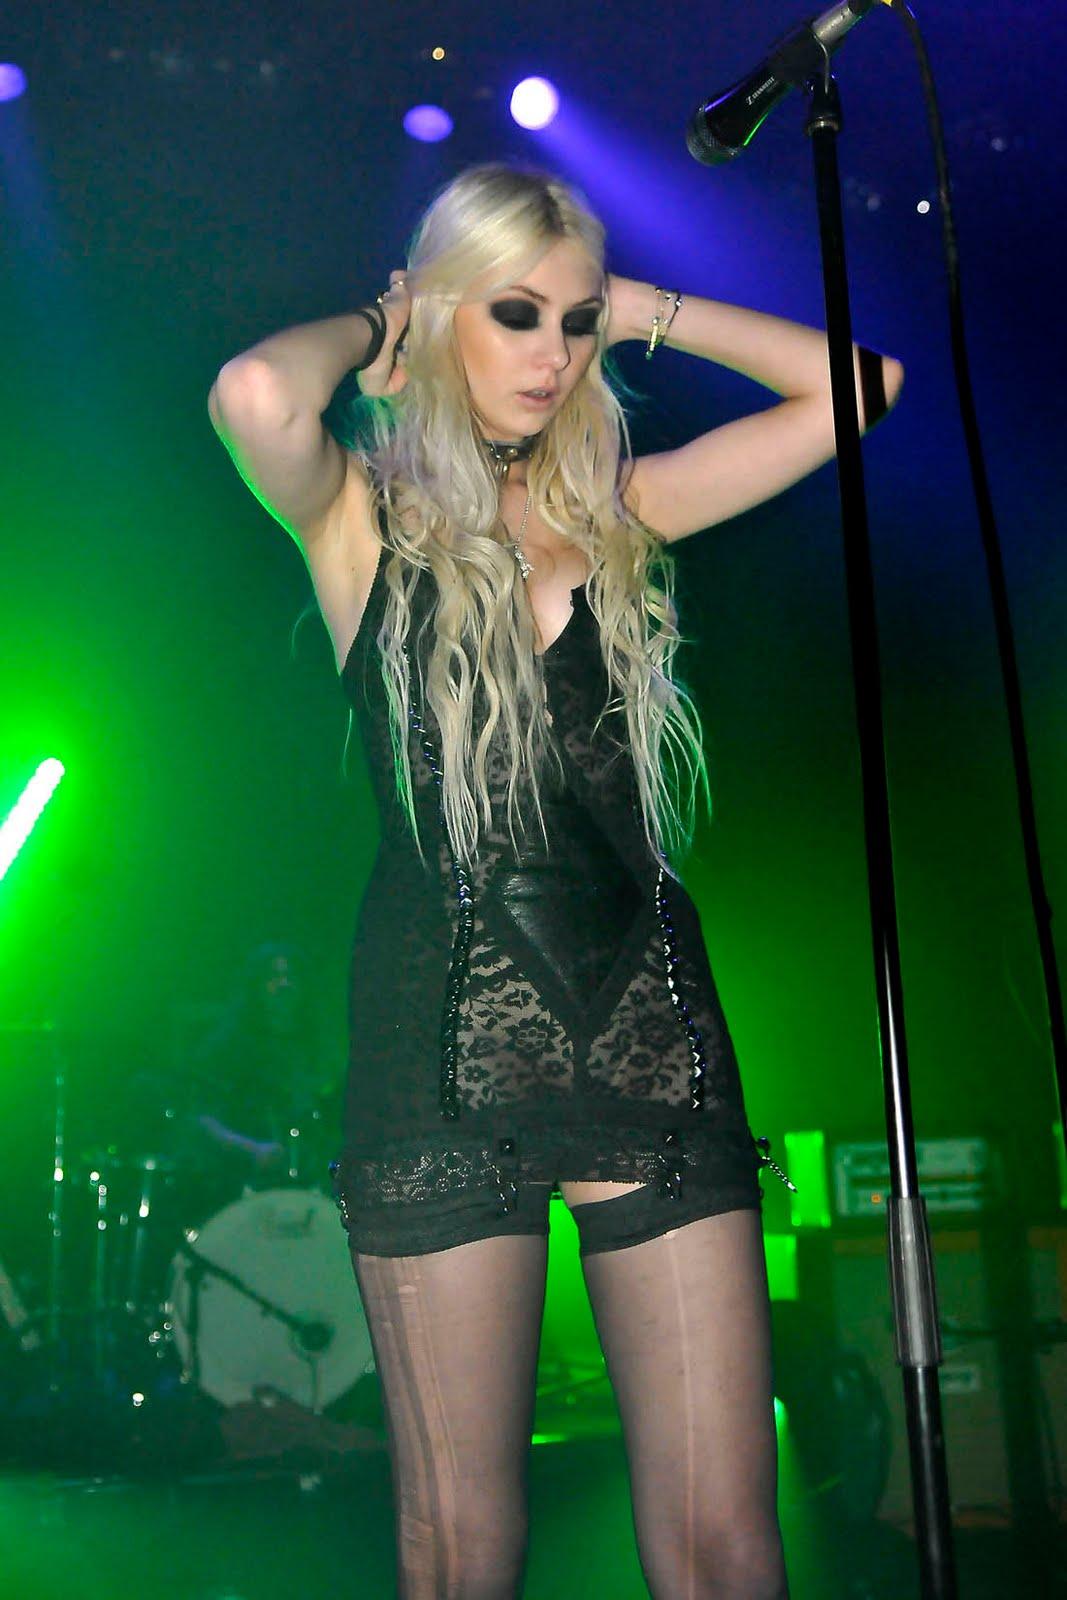 http://2.bp.blogspot.com/_QtvafxuWqCM/TS9y71YVO6I/AAAAAAAAAHQ/g2hr7RrWqGs/s1600/taylor_momsen_live_concert_5.jpg